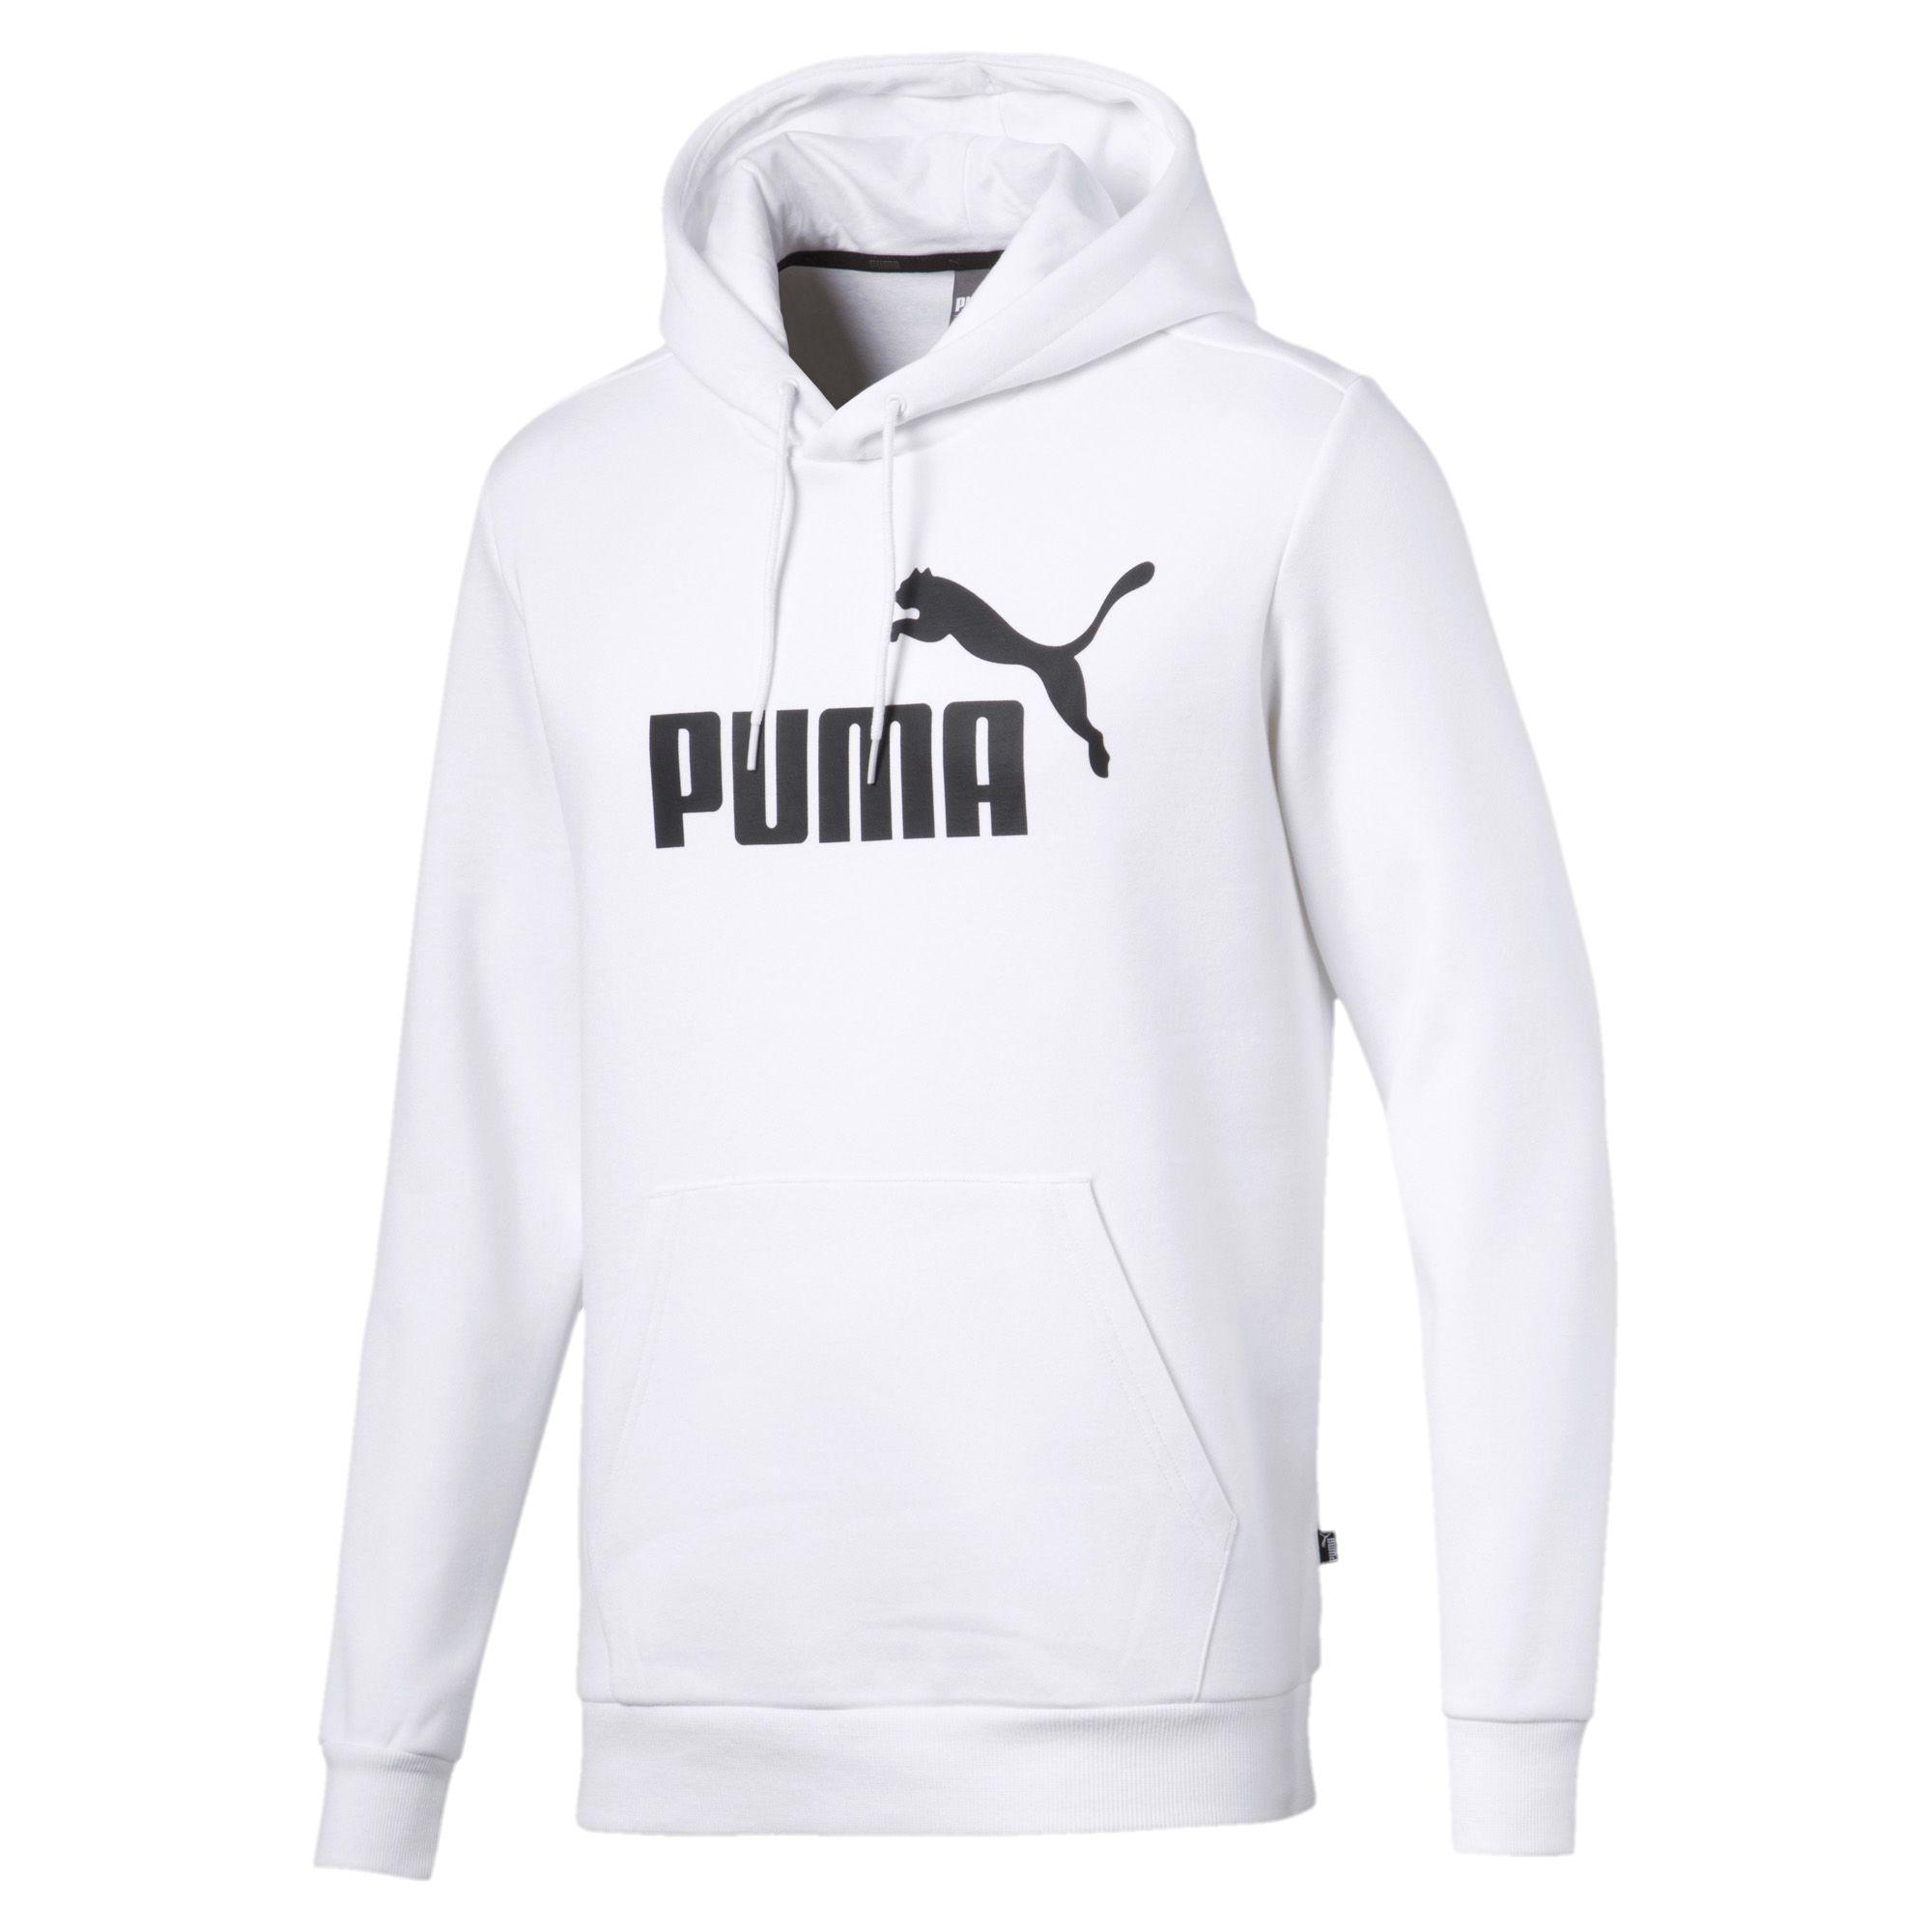 6eb07ee68 Lyst - PUMA Essentials Fleece Men s Hoodie in White for Men